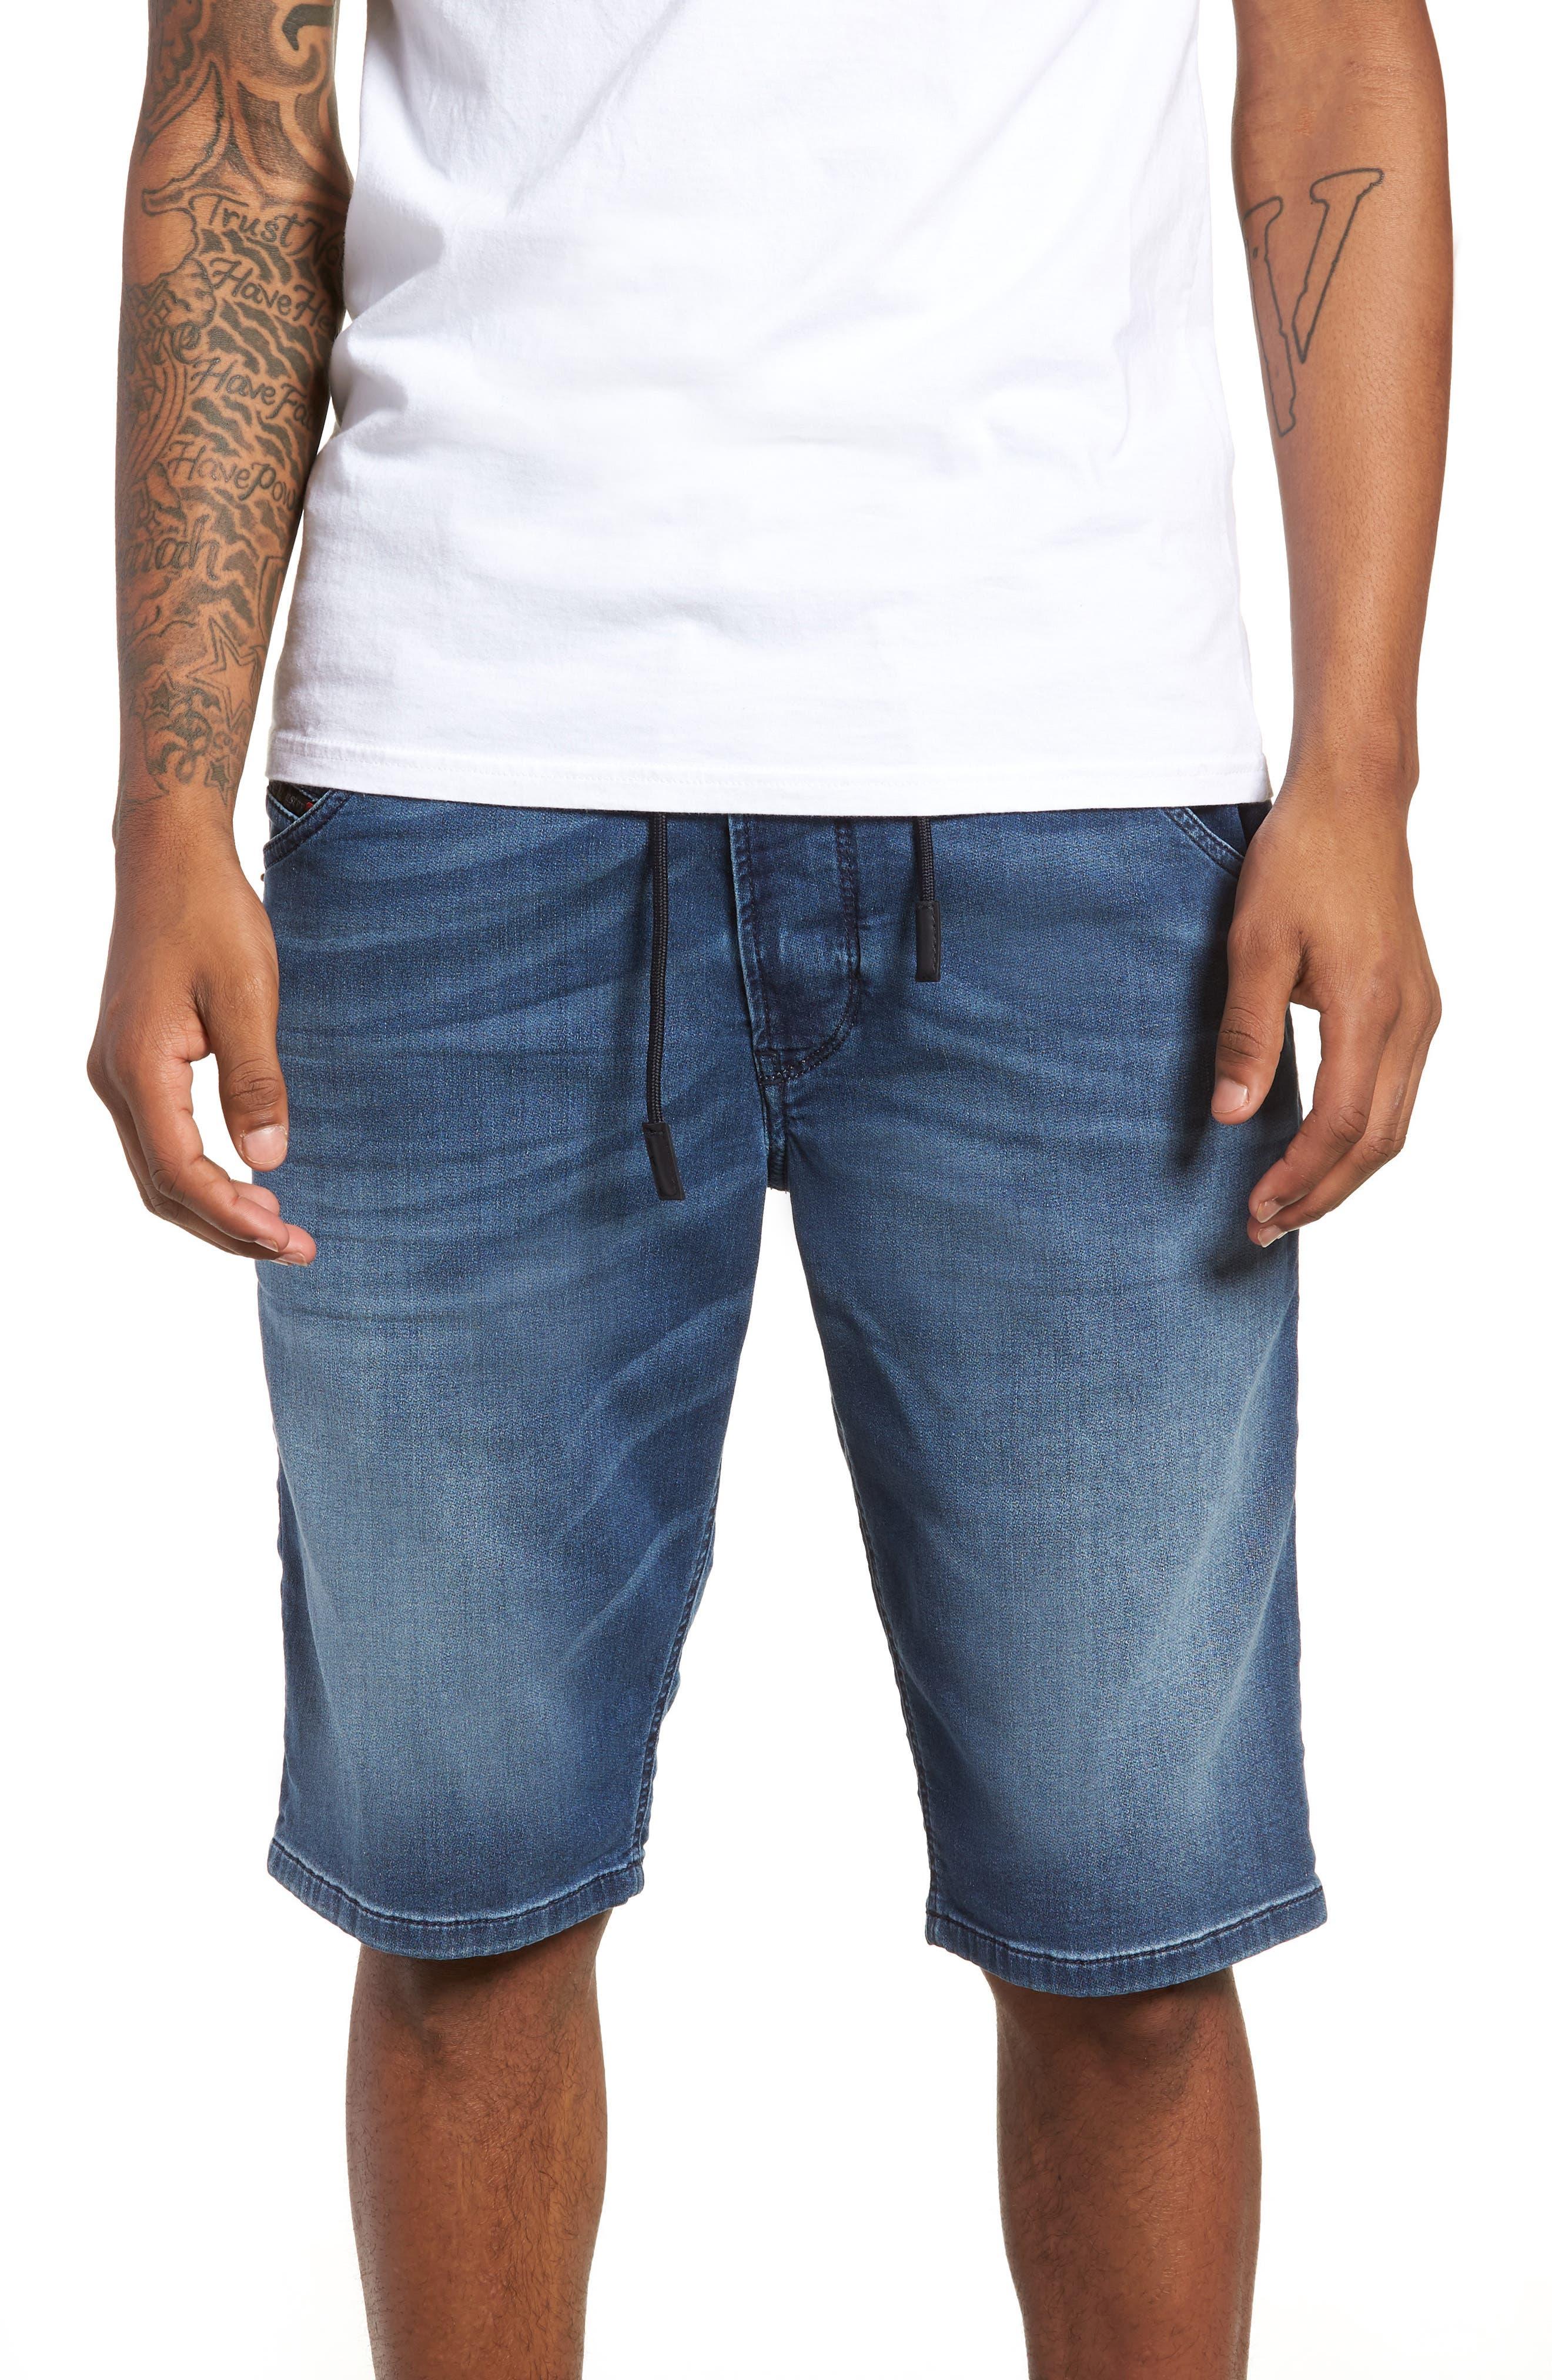 Krooshort Denim Shorts,                             Main thumbnail 1, color,